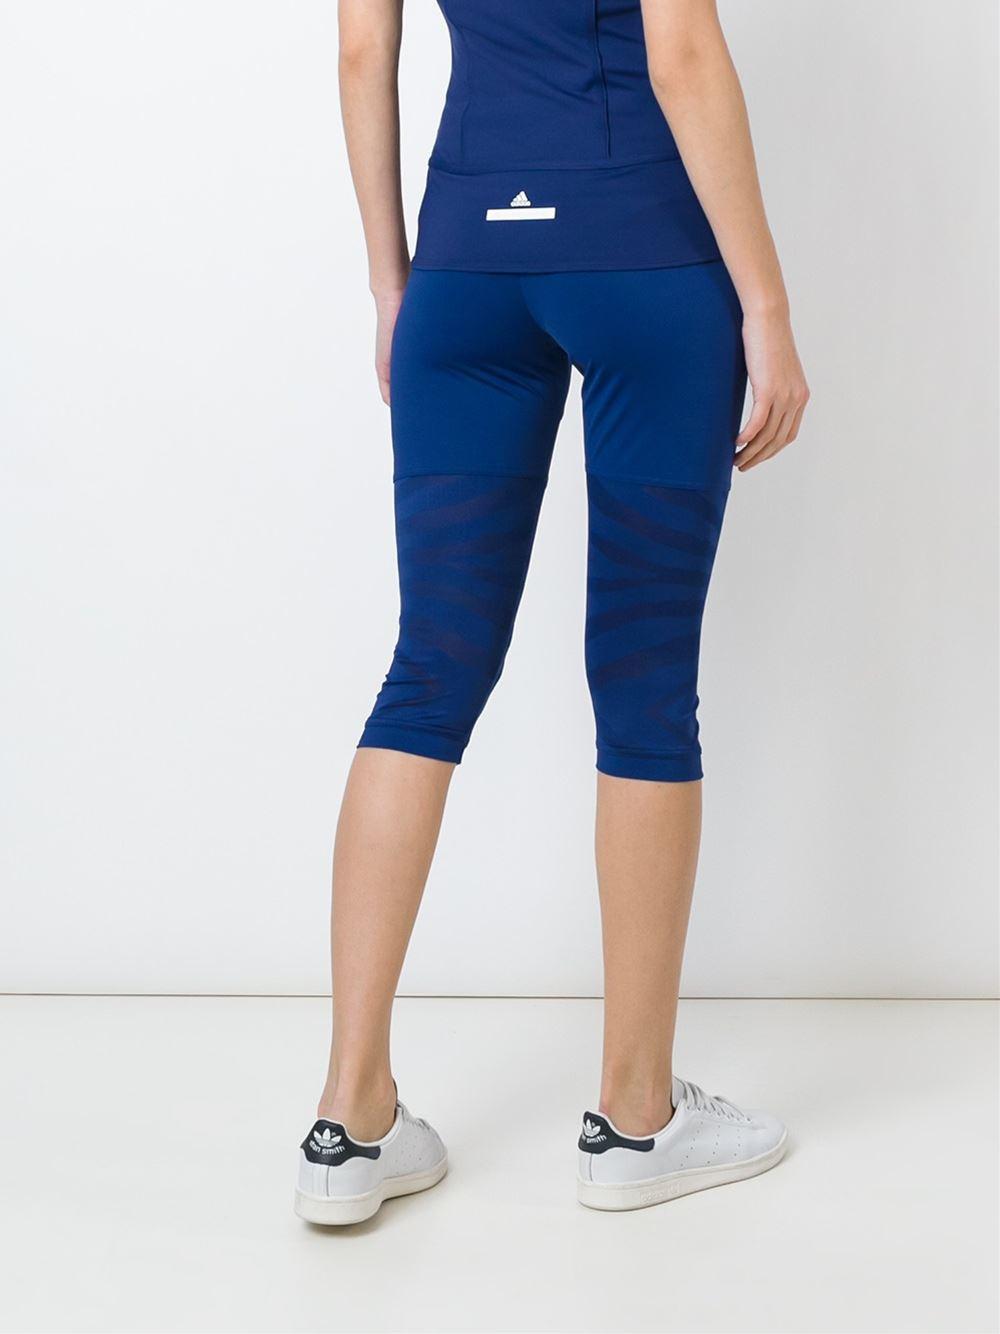 Adidas À Privées Privée 34 Vente Course Running Ventes Pantalon vwN8mn0